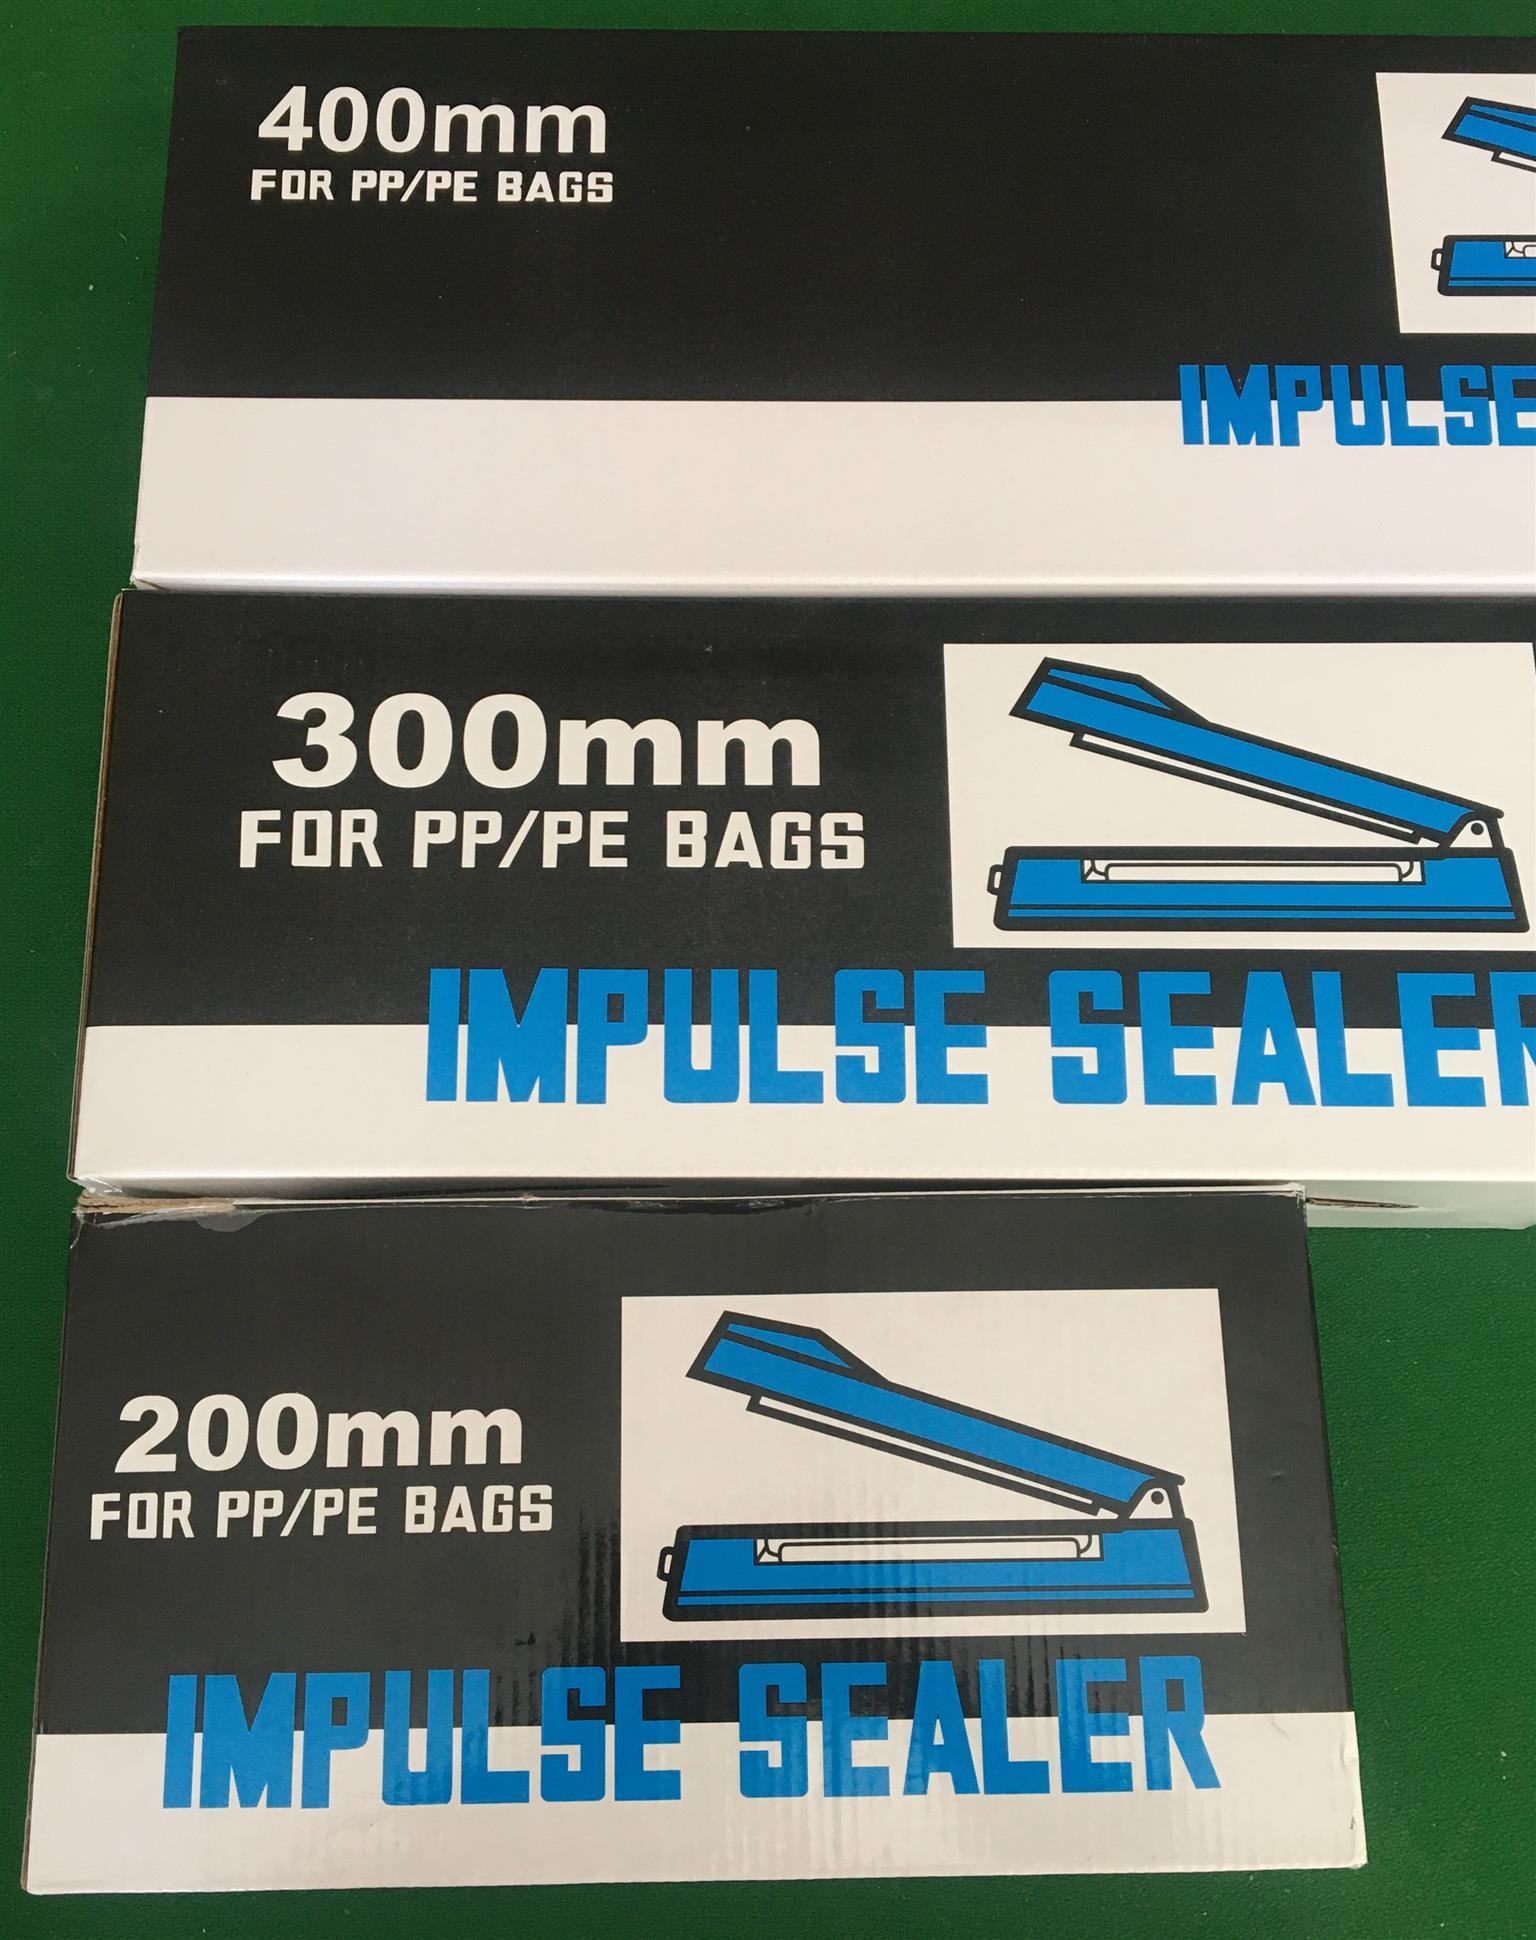 Hand Impulse Heat Sealers